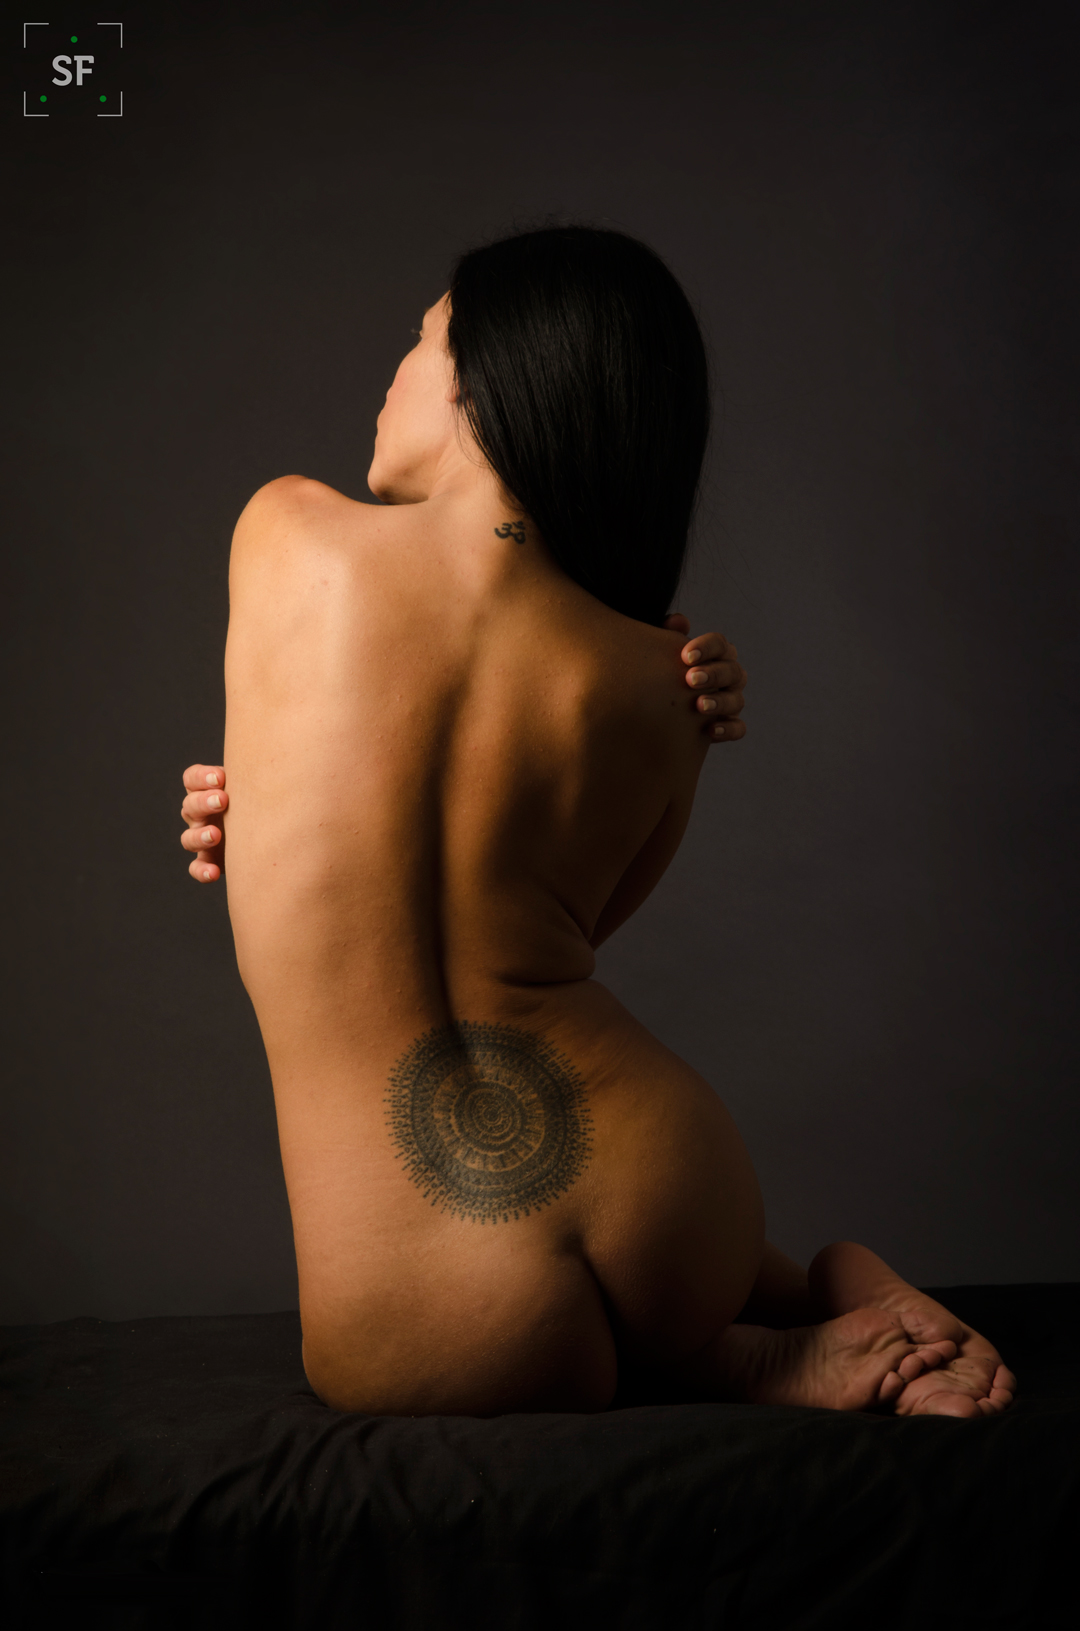 desnudo+fotografo+fotografia+modelo